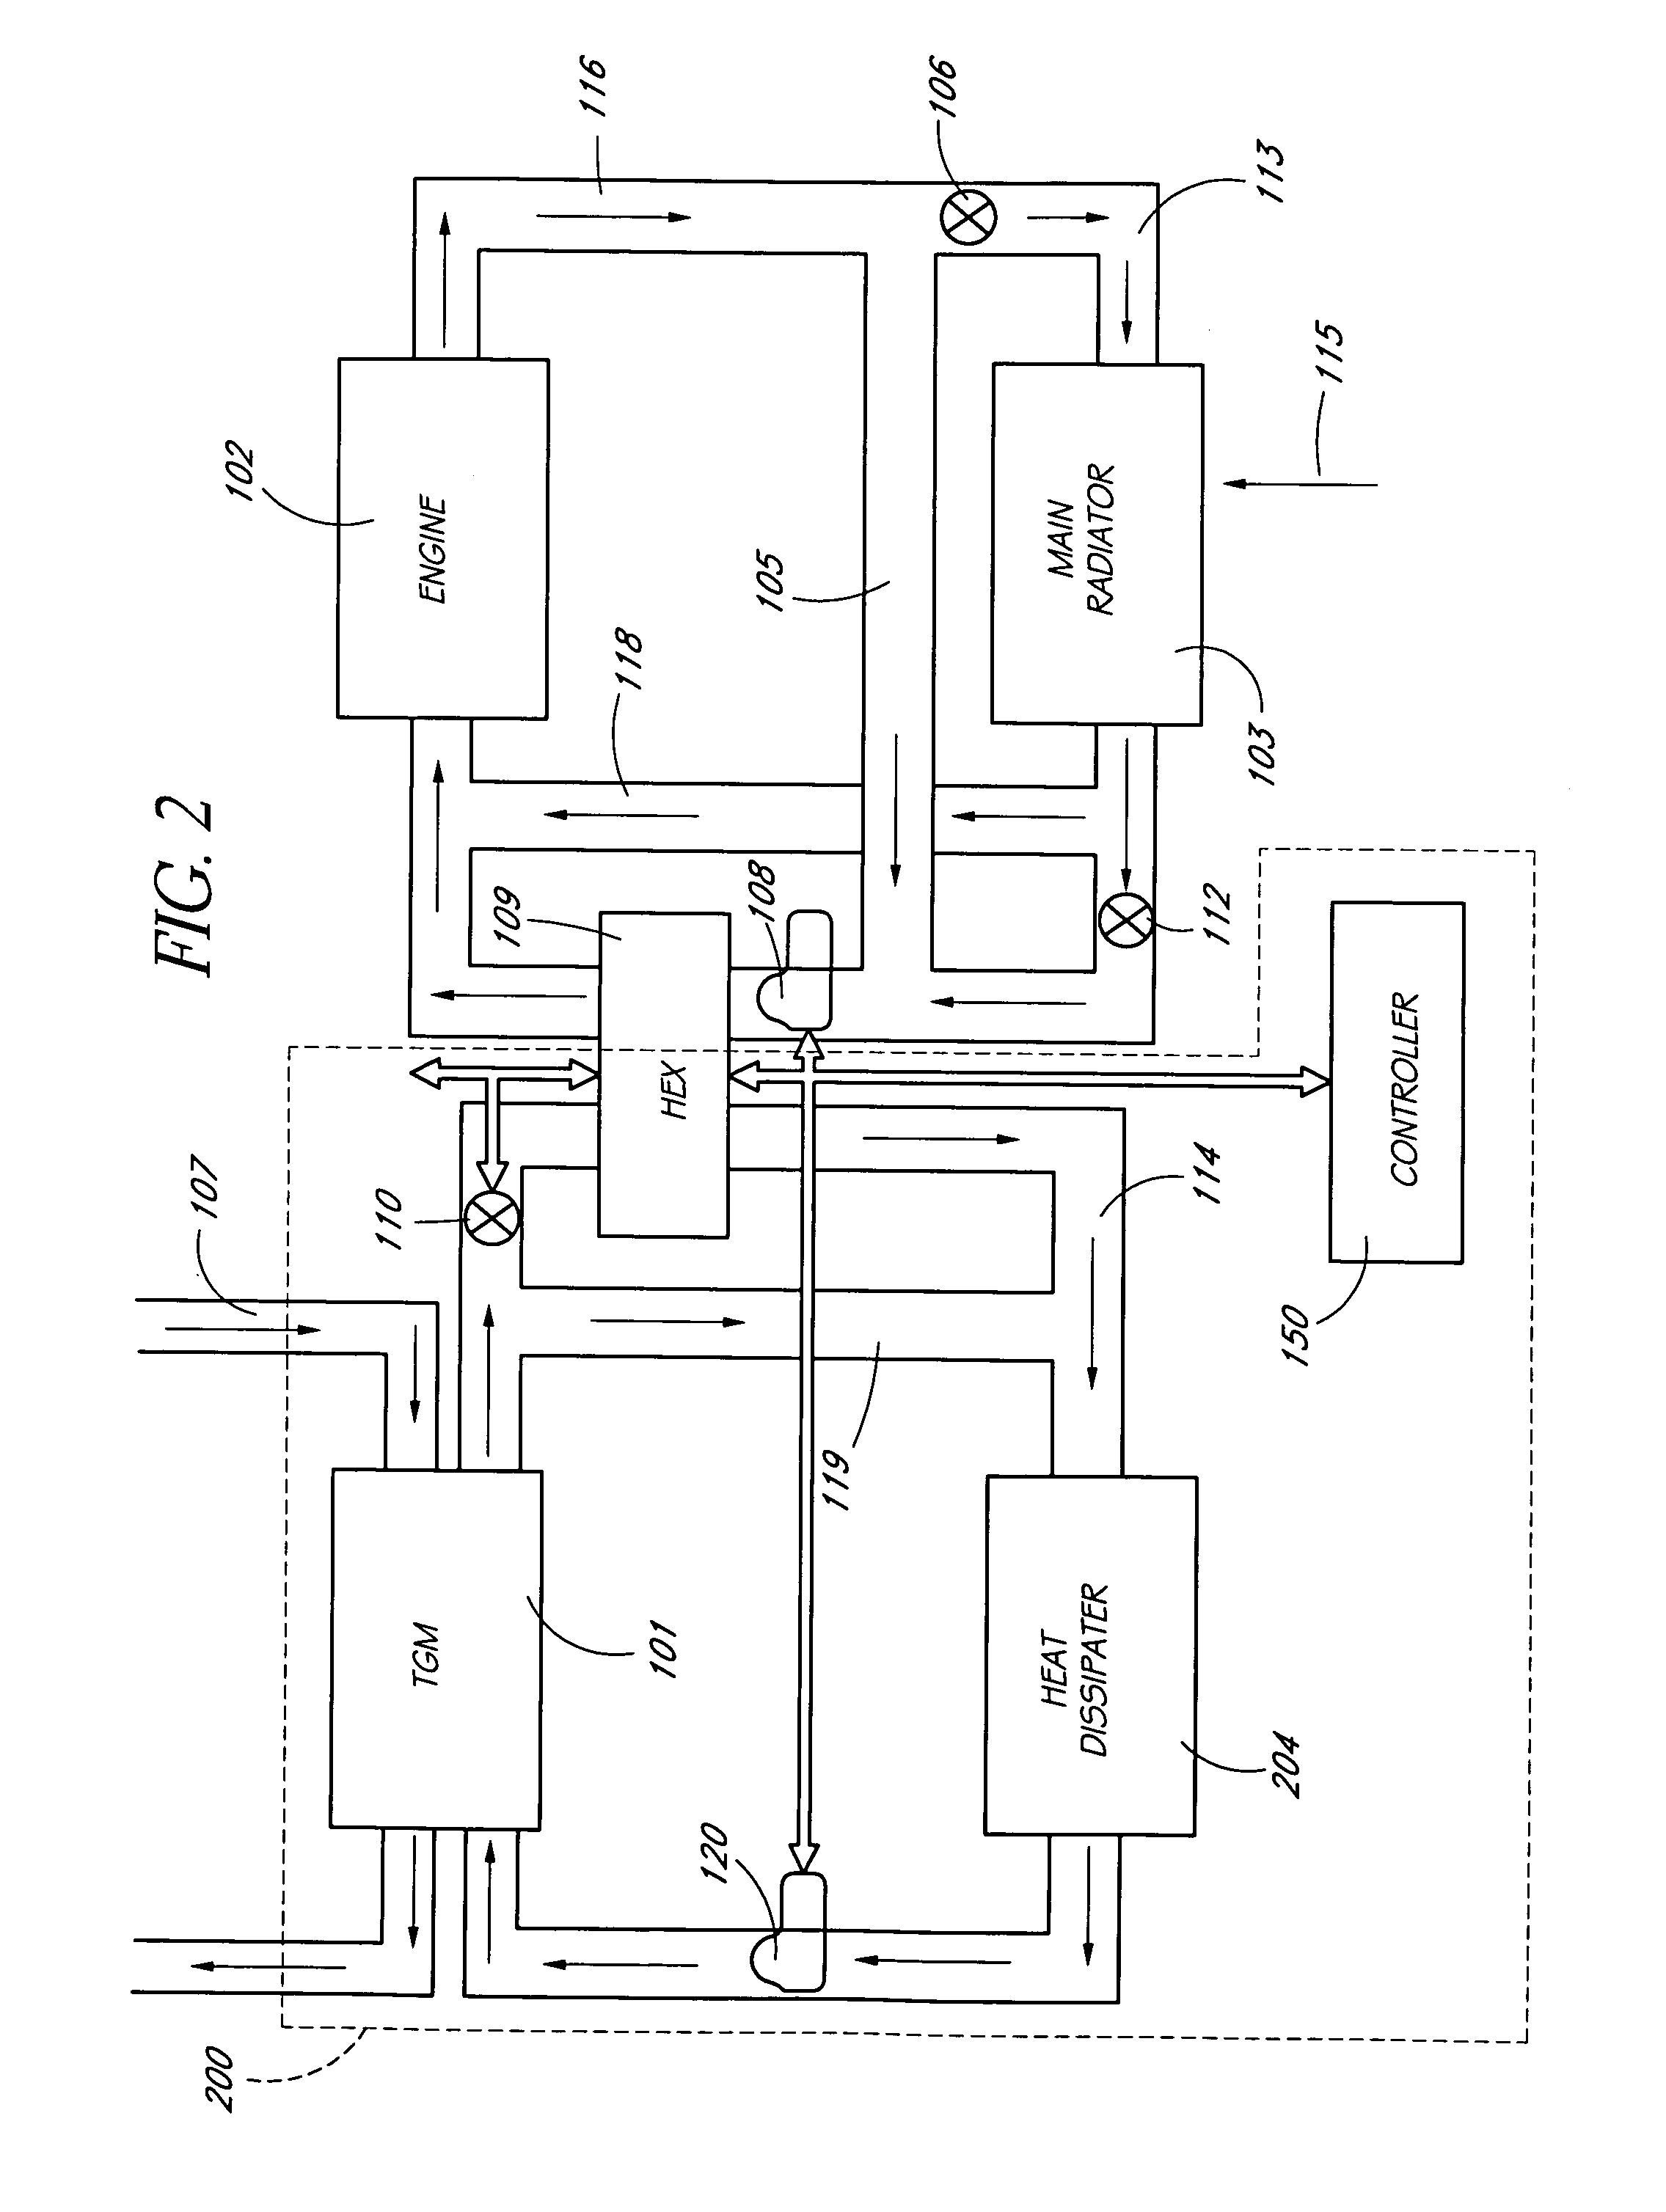 patent us7608777 - thermoelectric power generator with intermediate loop